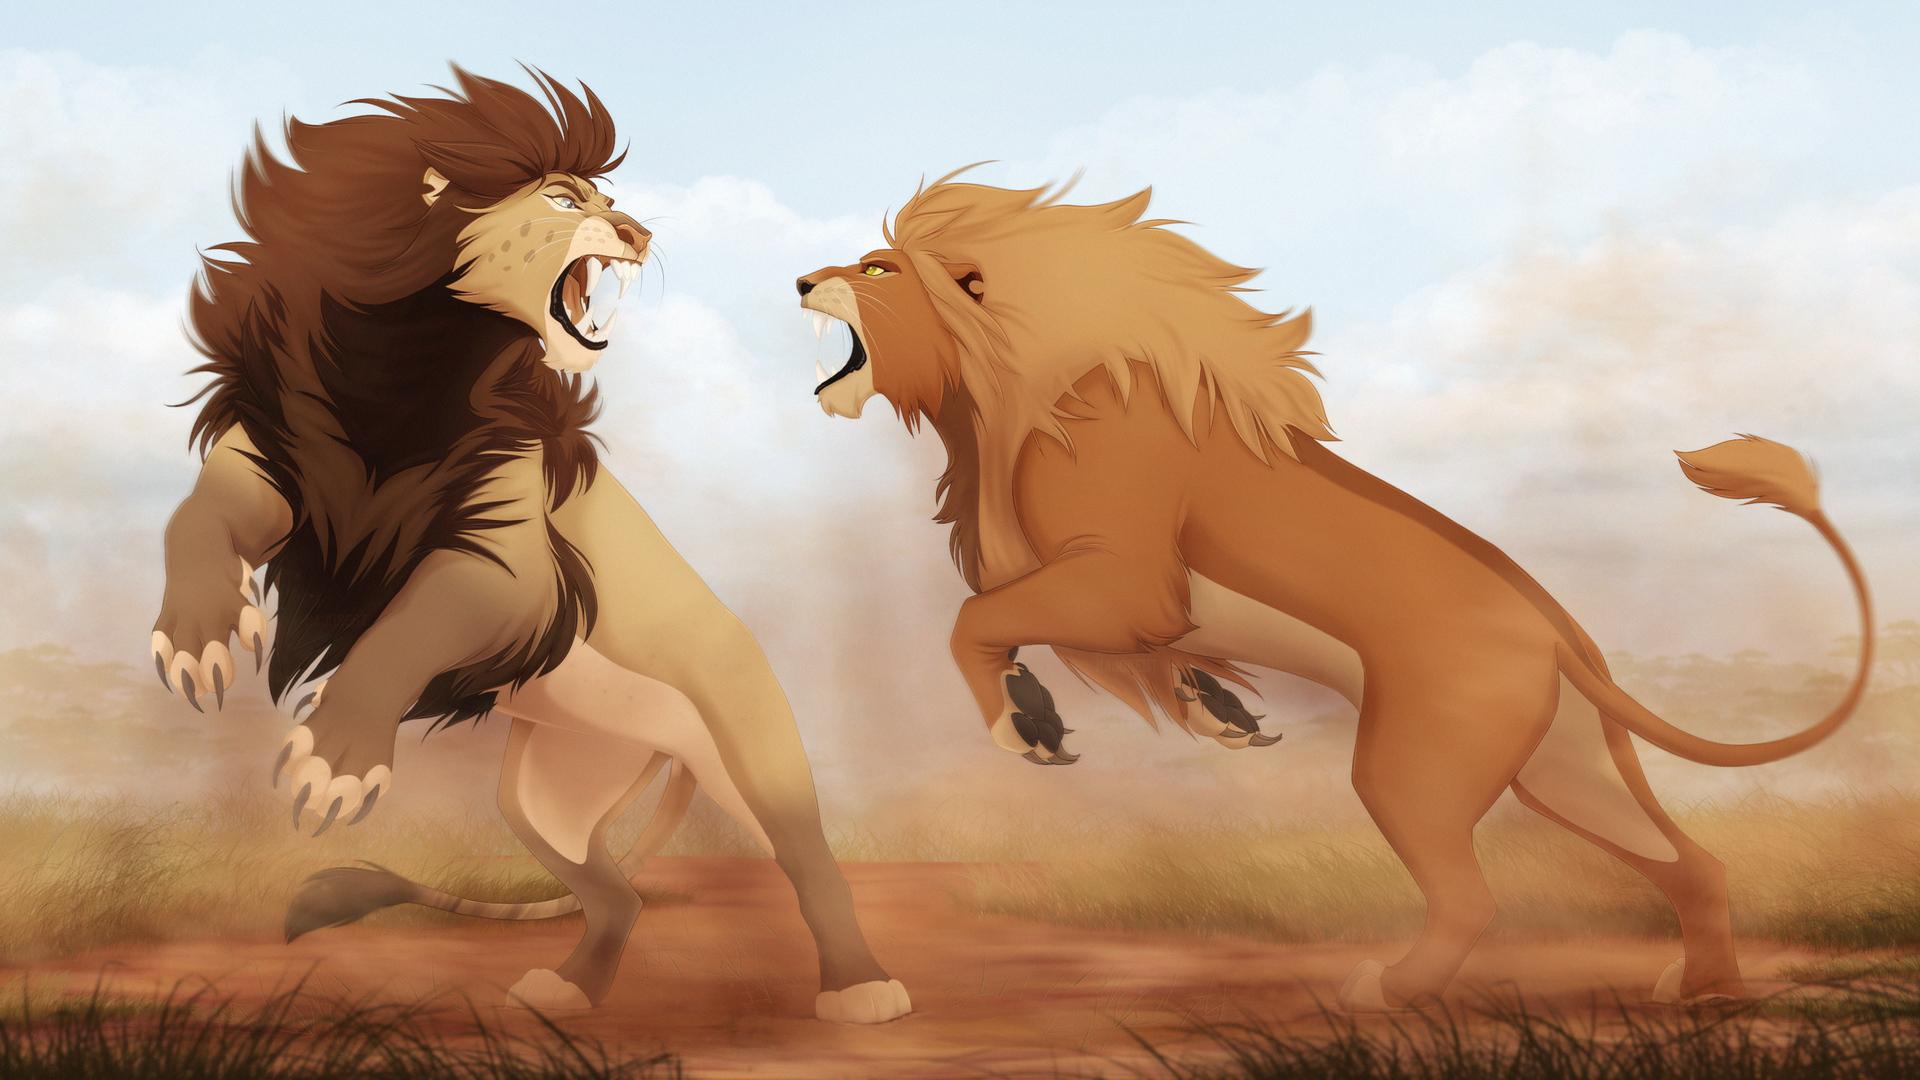 lions-fight-artwork-4k-x8.jpg